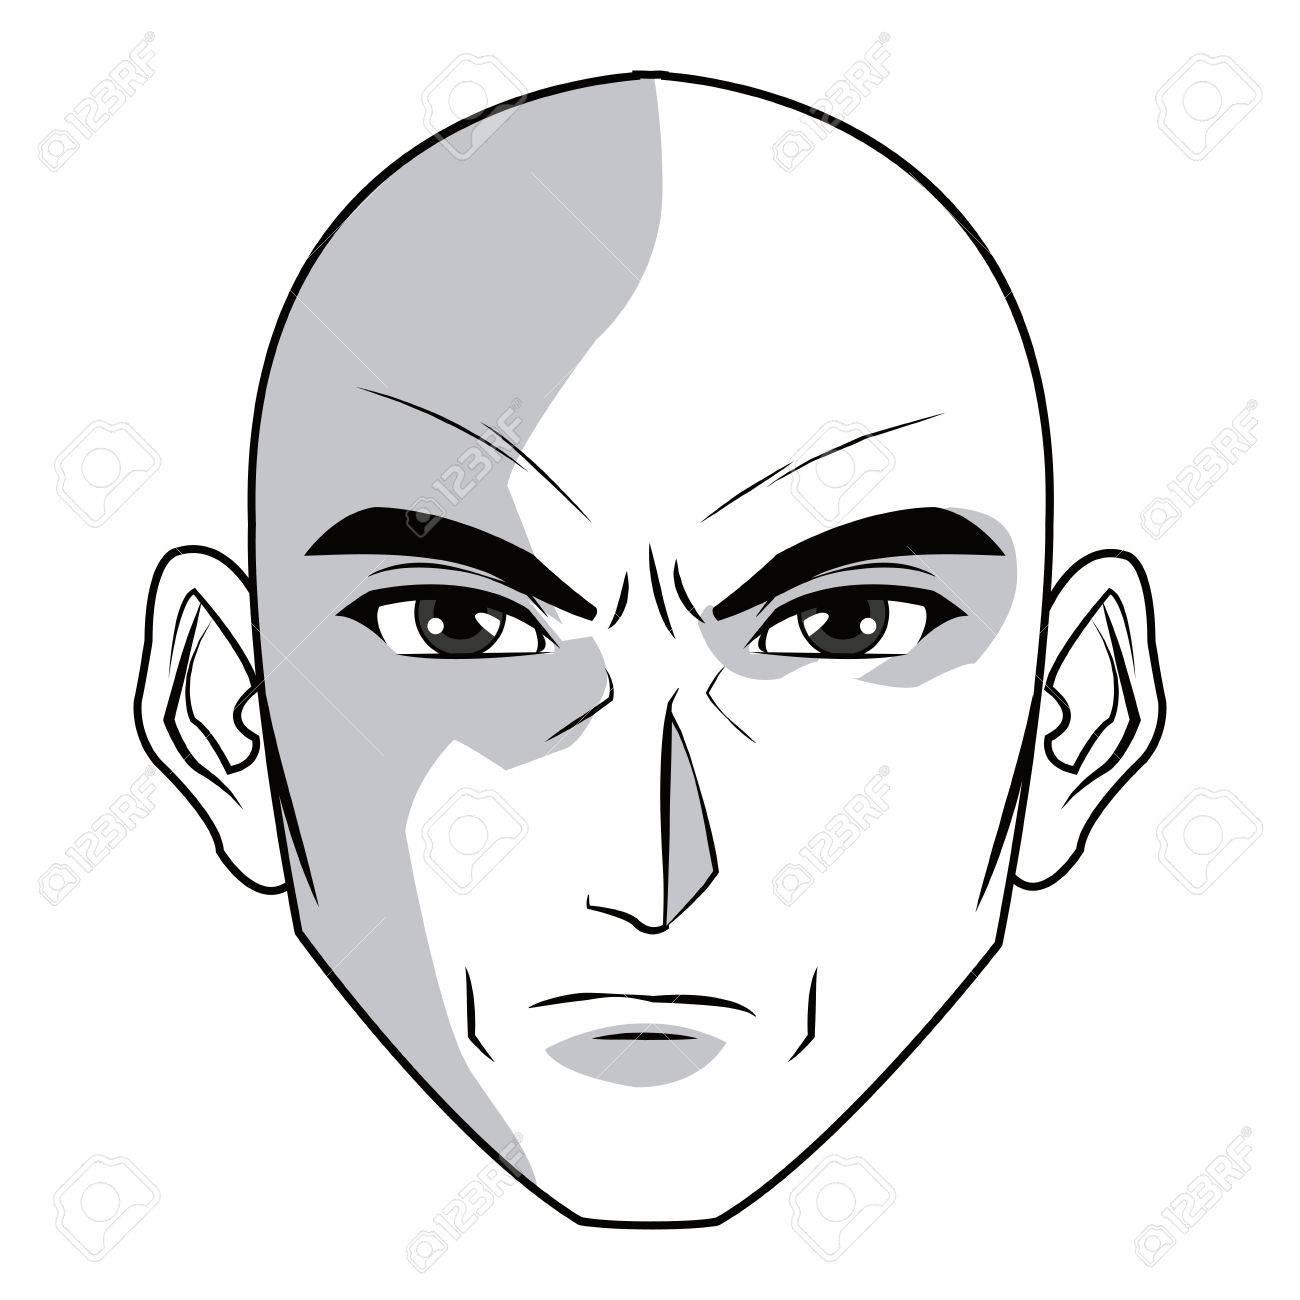 1300x1300 Anime Style Drawing Tutorial Chibi Manga Tattoos Eyes Cartoon